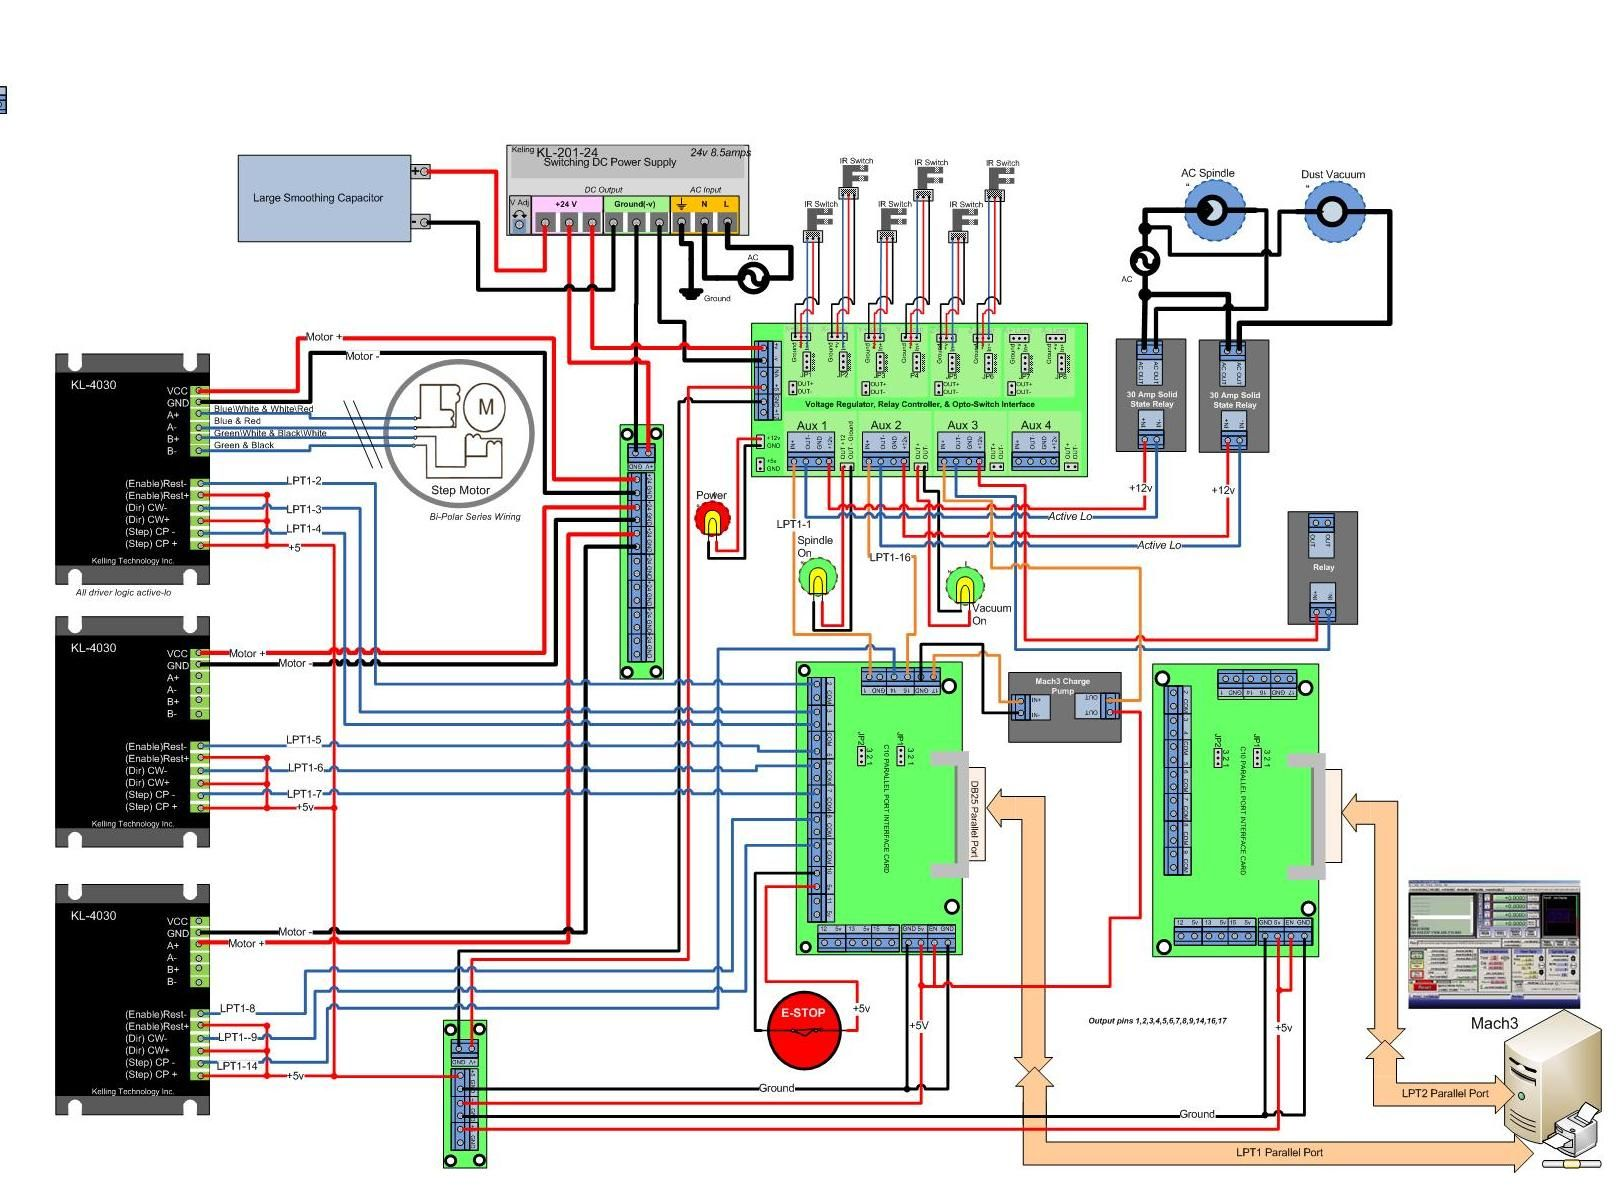 5 Axis Cnc Breakout Board Wiring Diagram Direct Online Starter W 2019 Pinterest